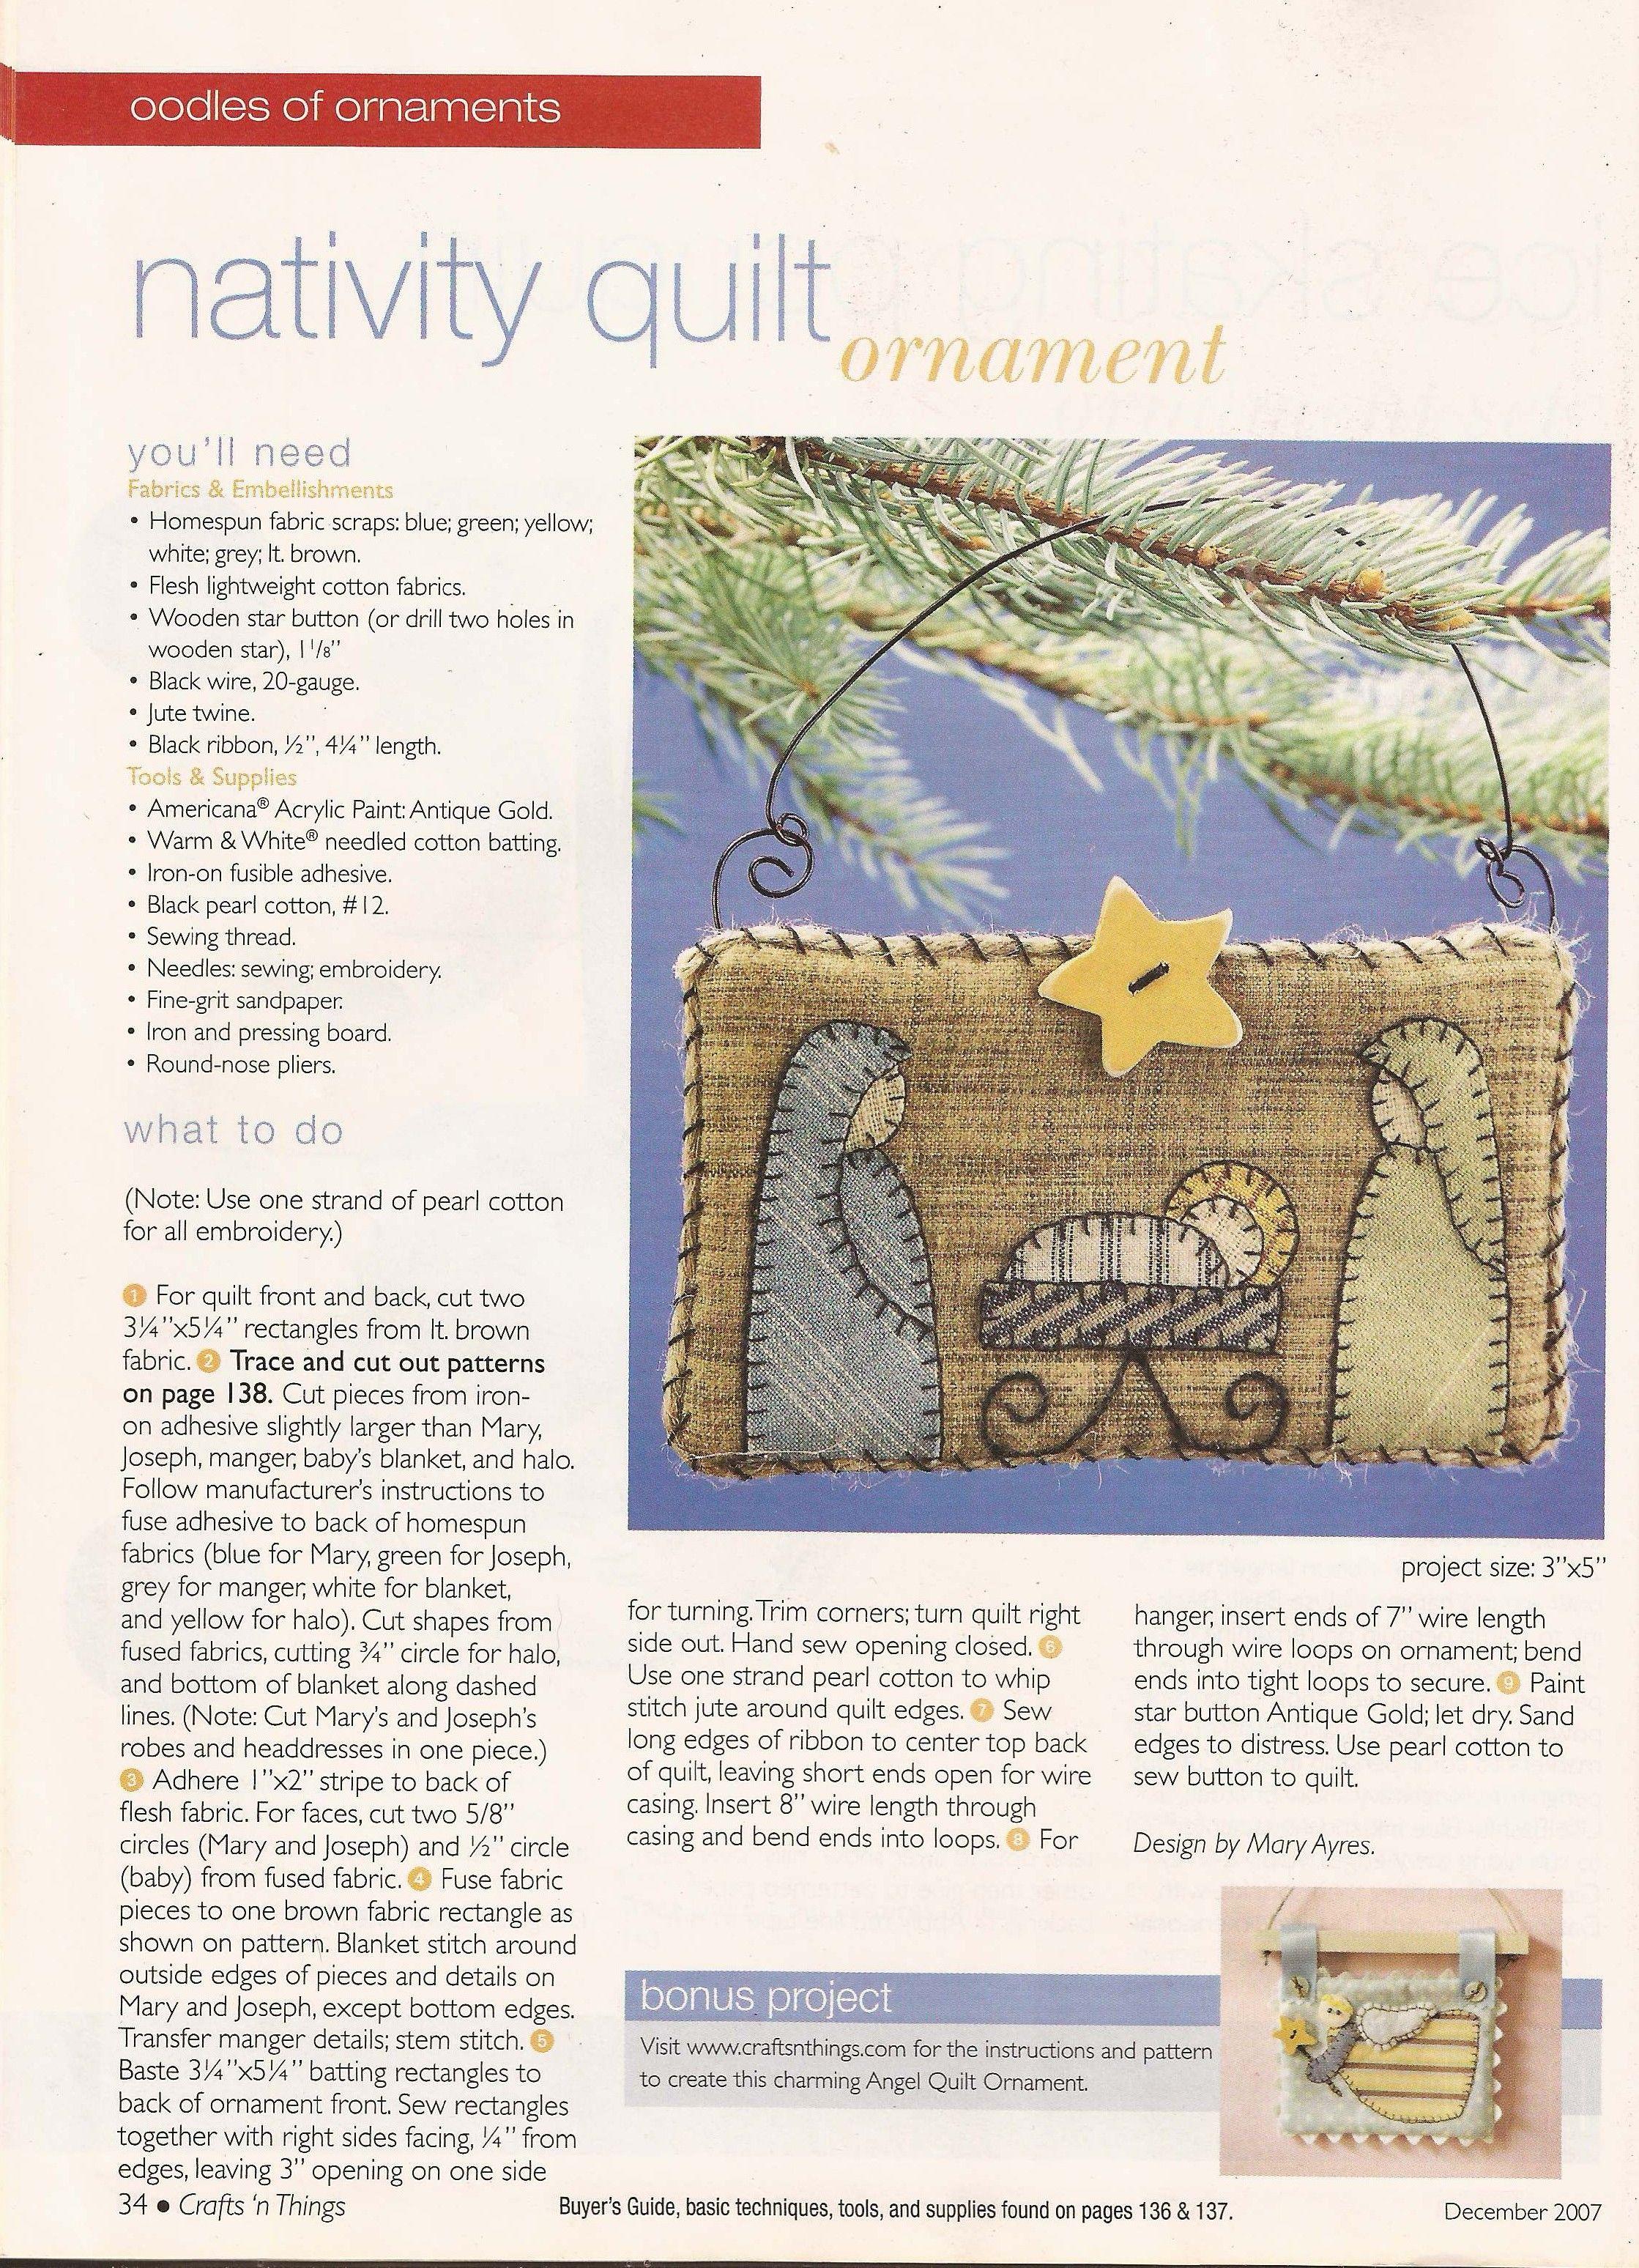 nativity-quilt-ornament.jpg 2238×3096 pikseliä